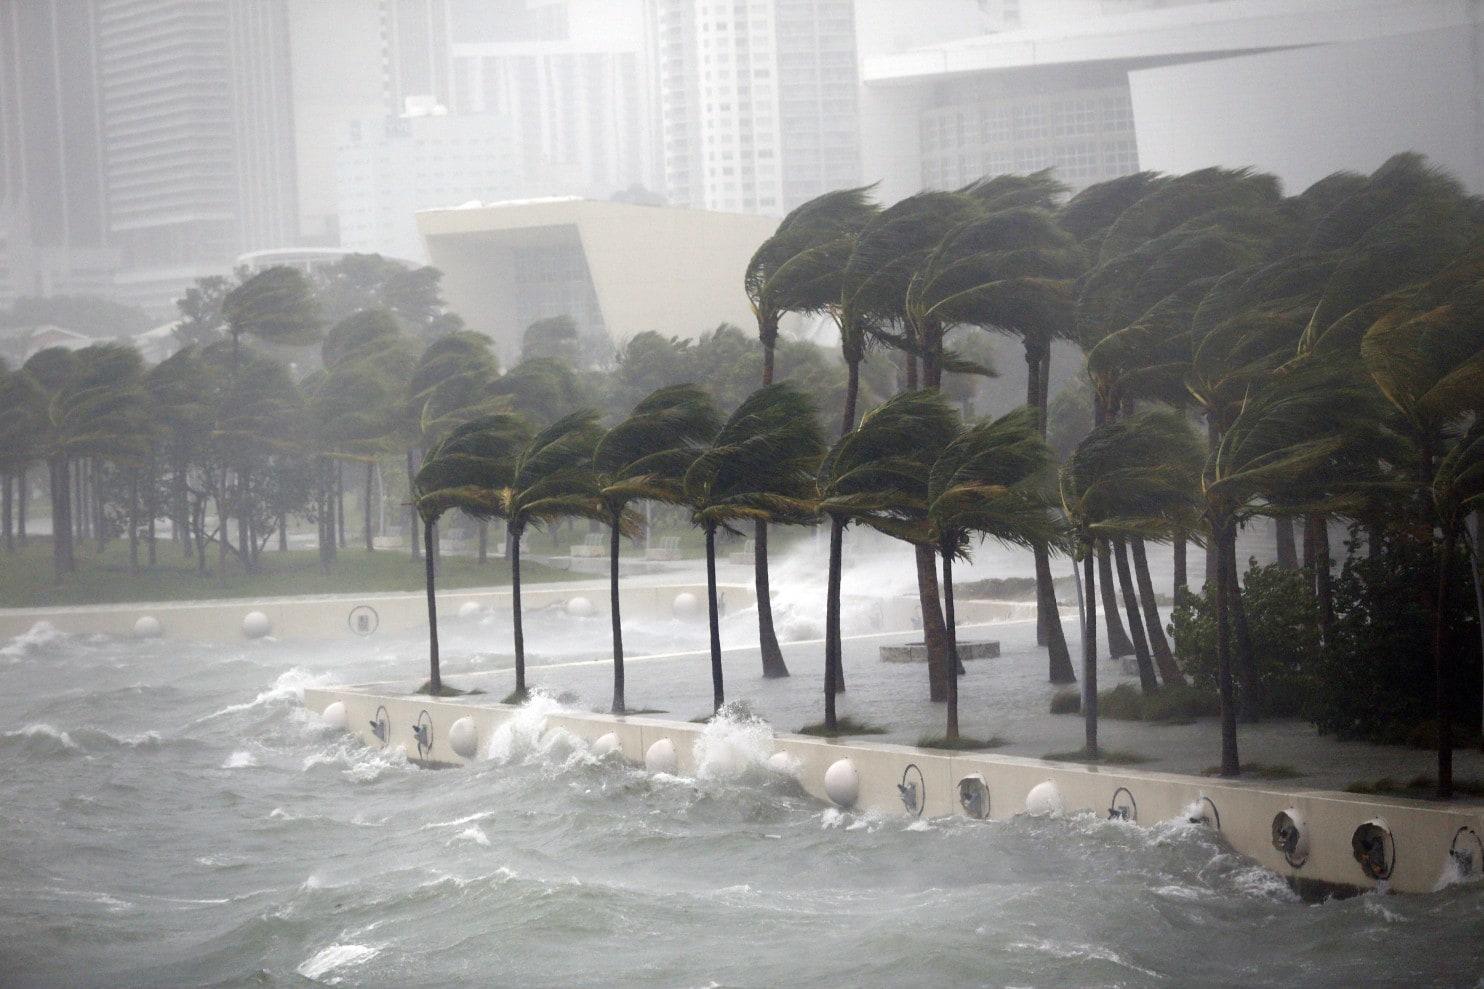 Hurricane Irma Delays Of Shark And Man International Release